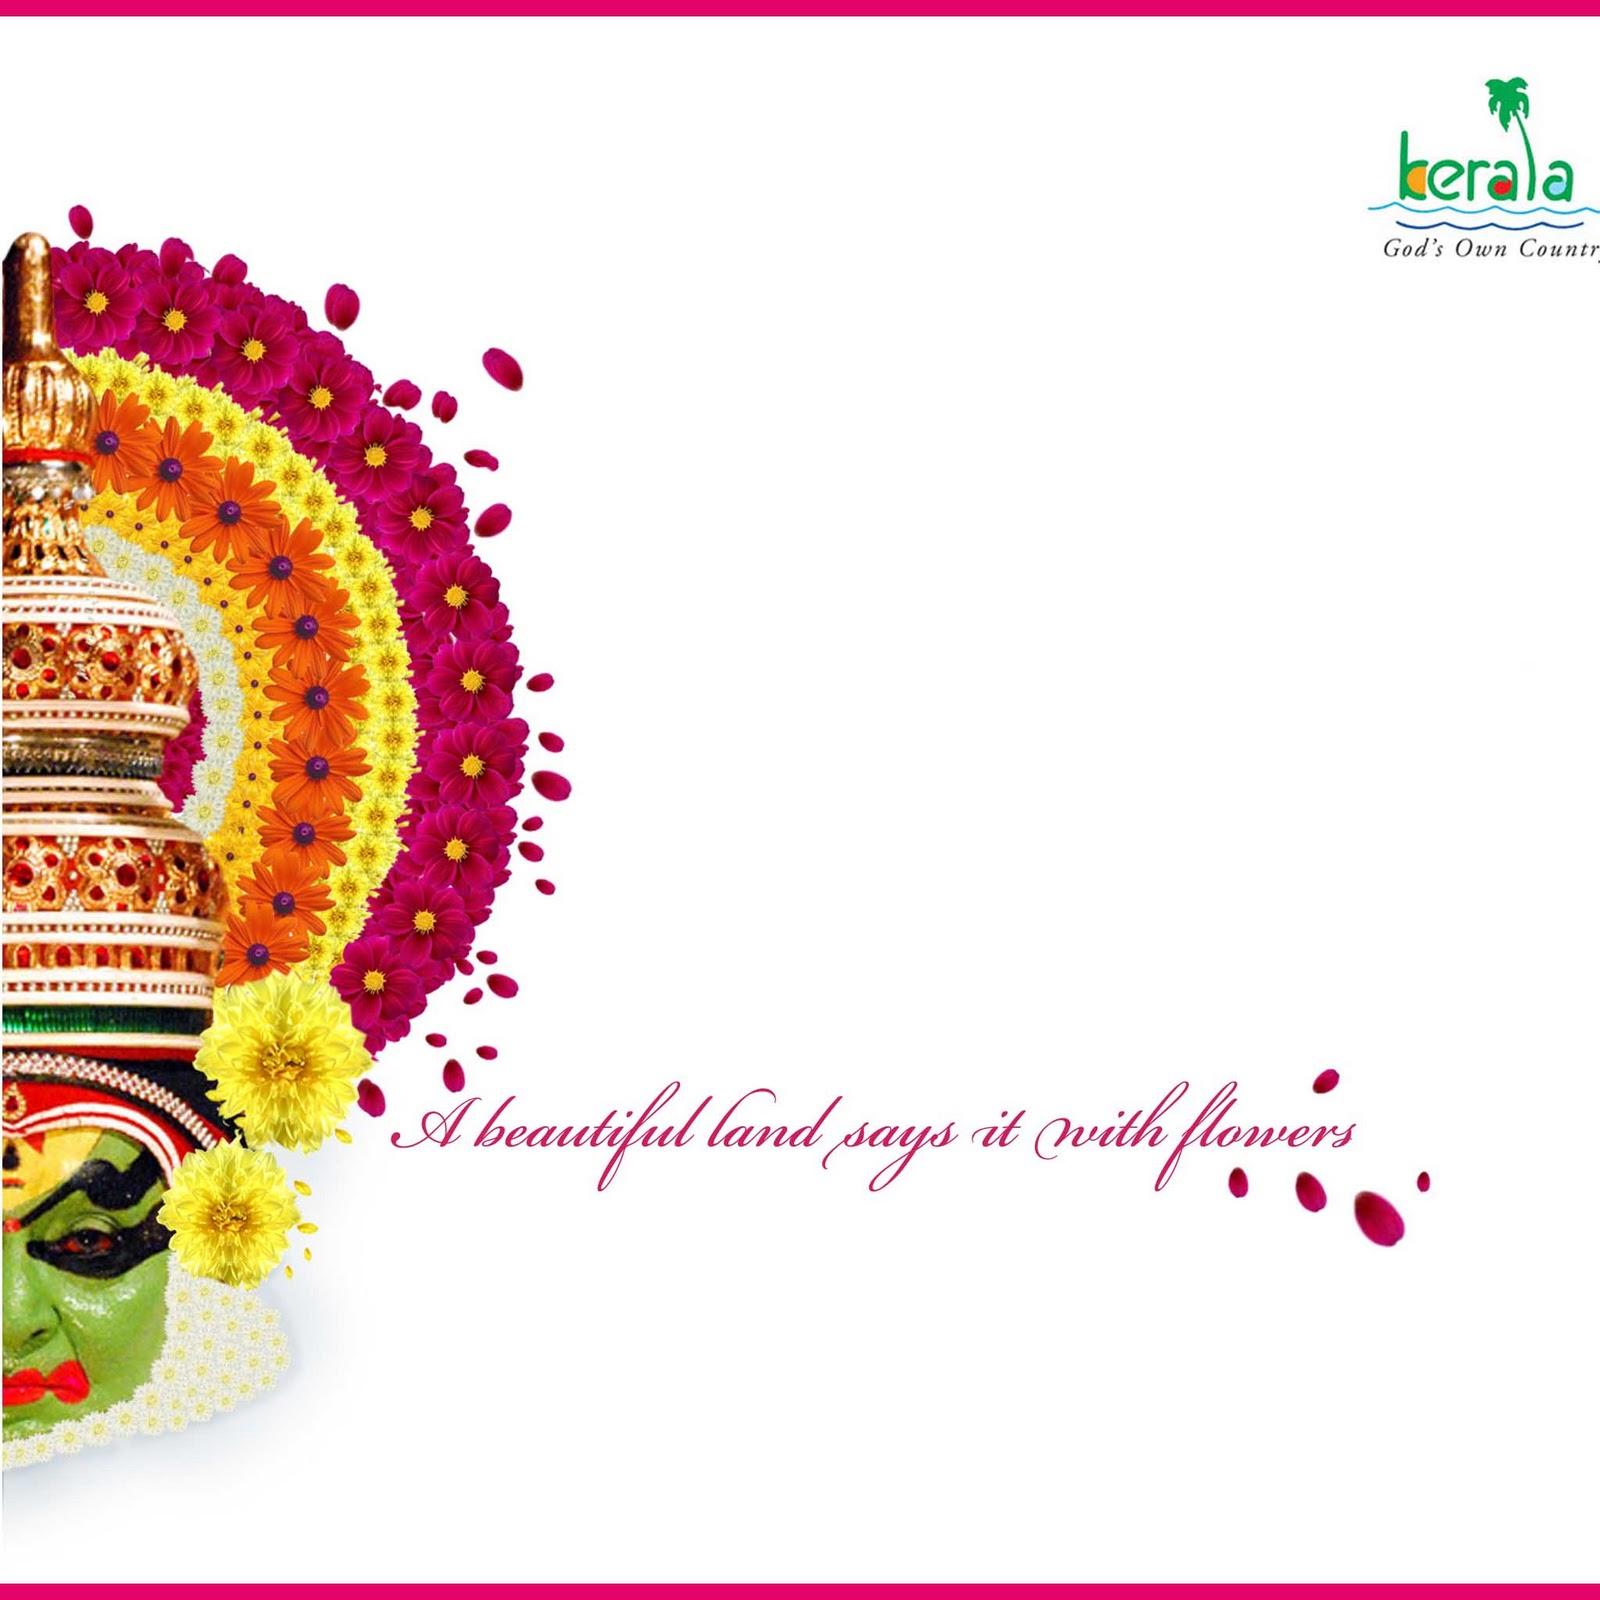 Creative Design Area Kerala Tourism Onam Greeting Card 2010